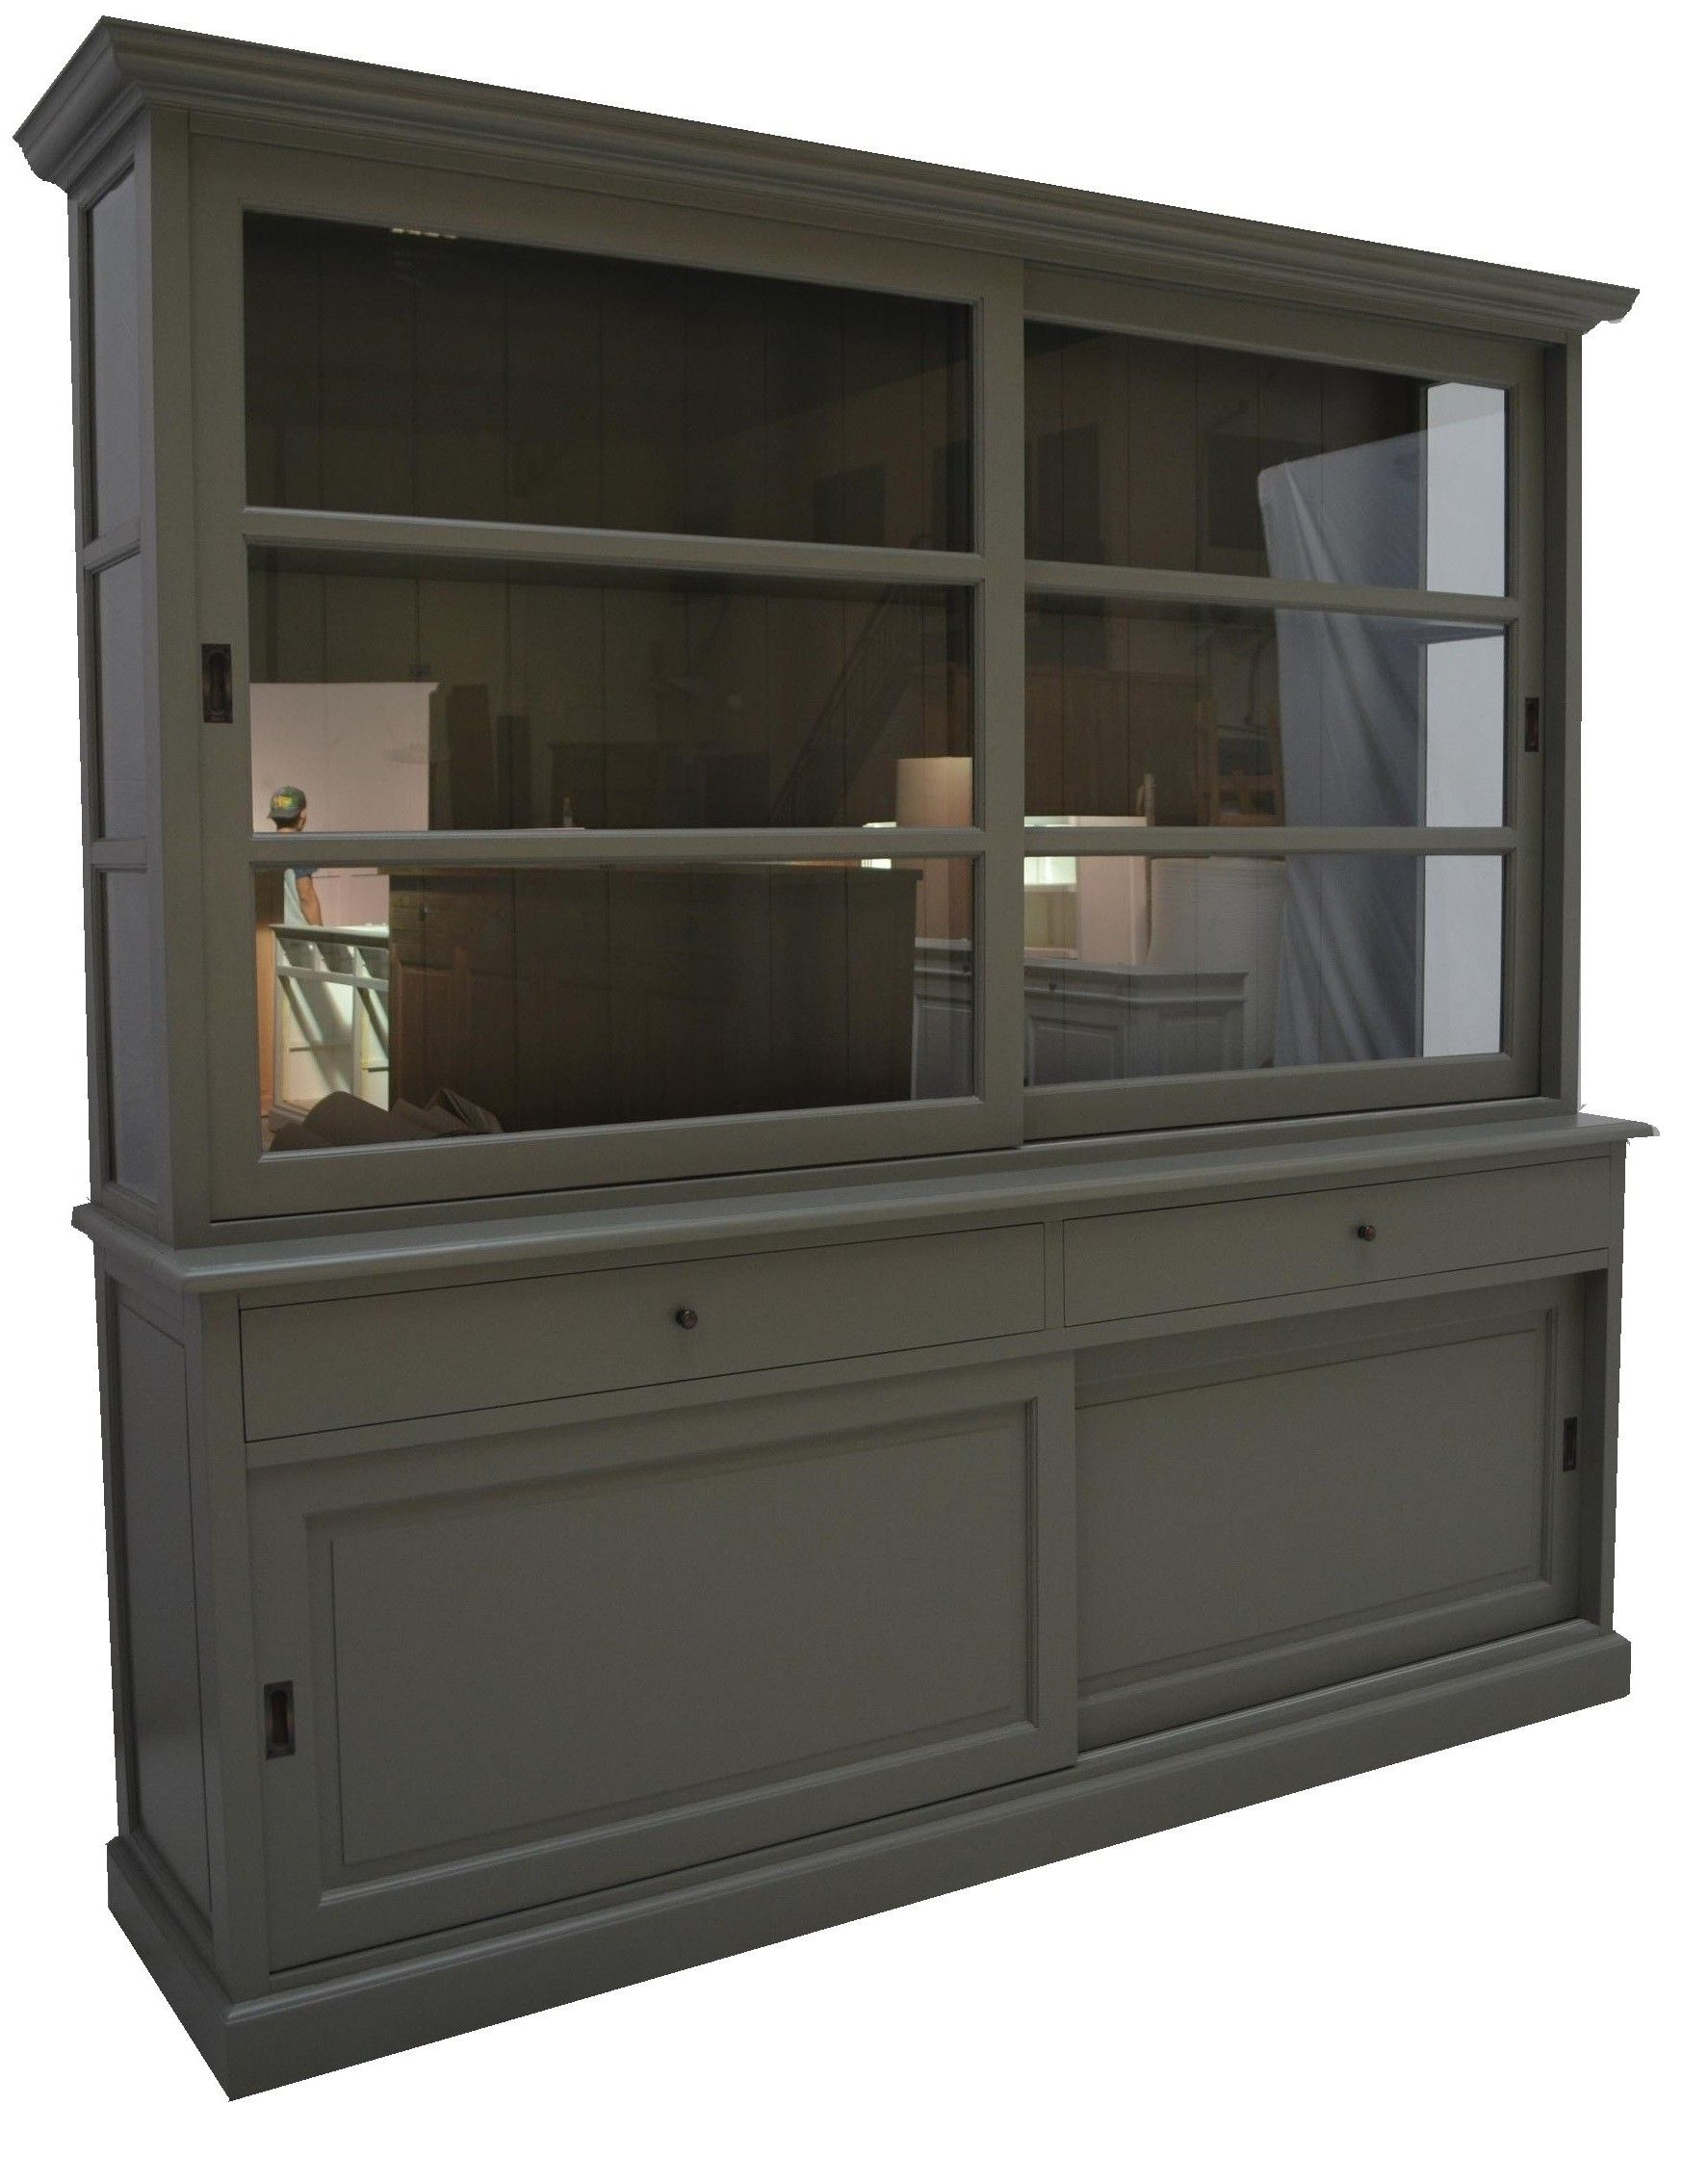 Buffetkast engels groen groen Lisse 220cm - huiskamer ...